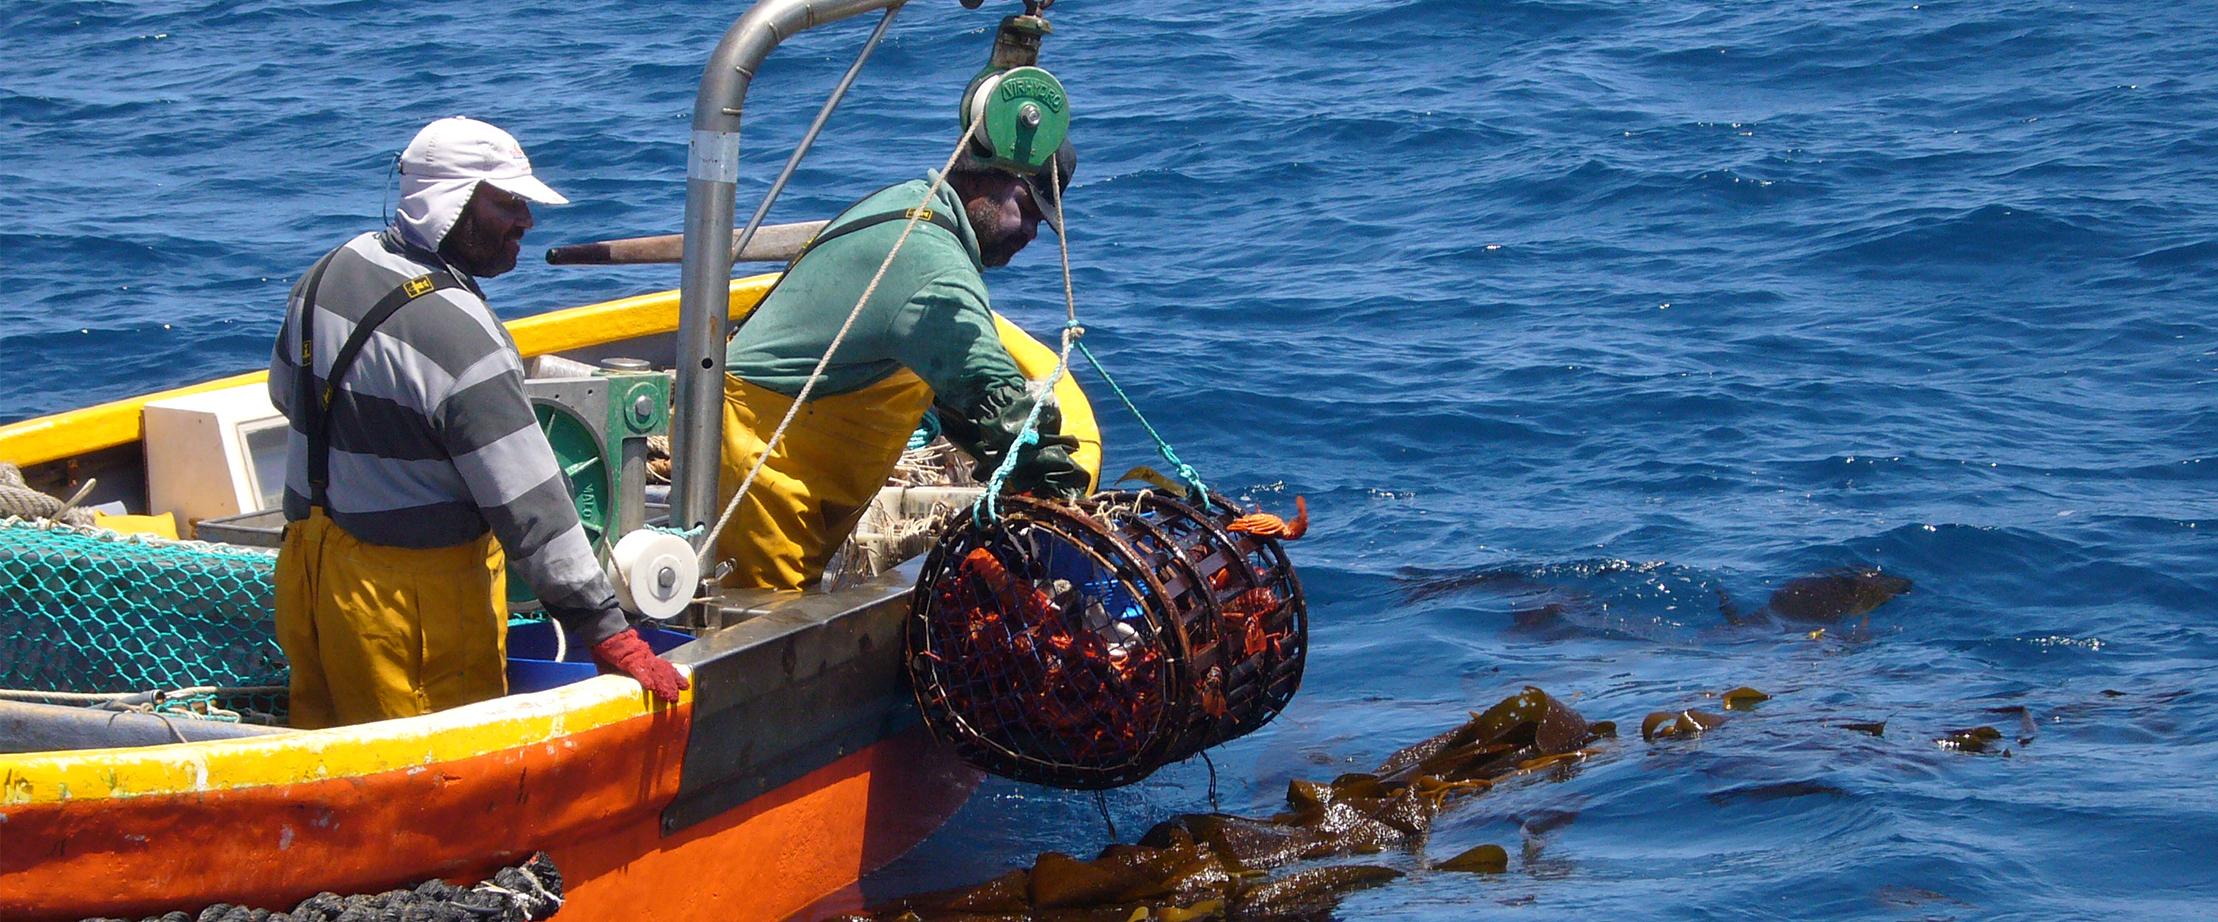 Gestion des ressources marines